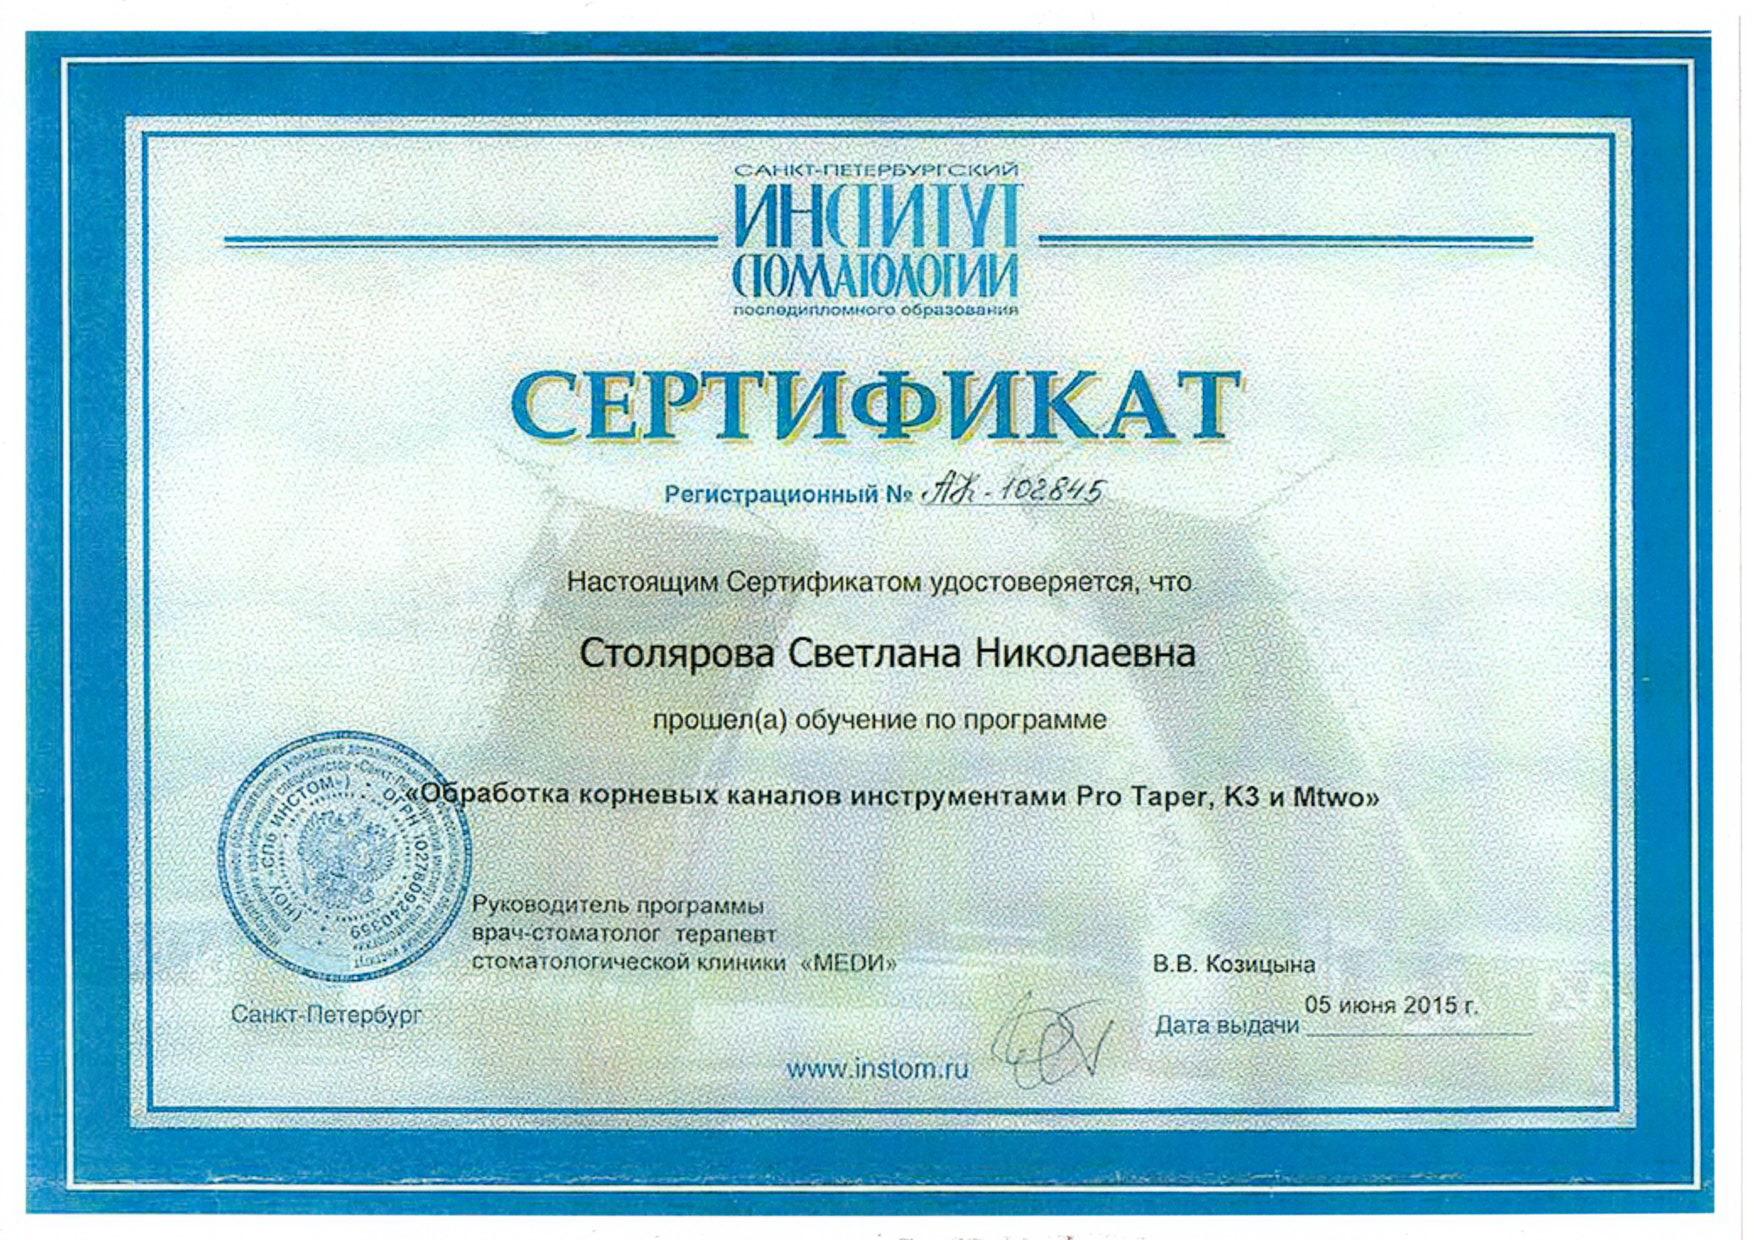 Столярова Светлана Николаевна - Сертификат_08